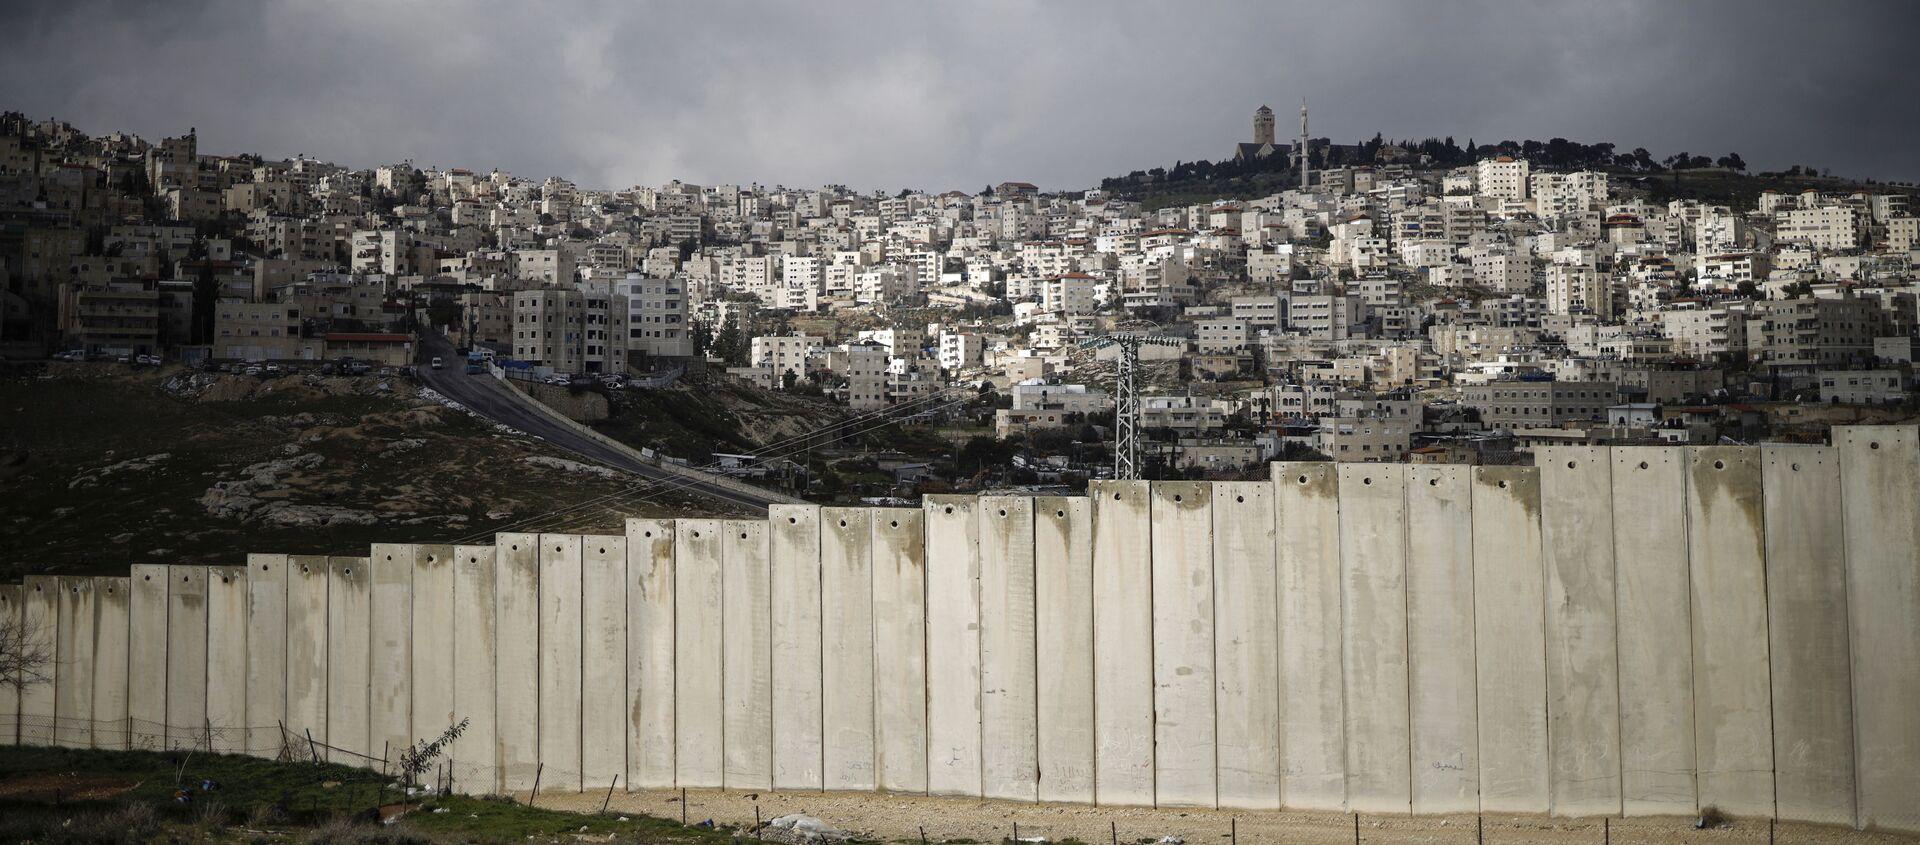 La barriera tra Palestina a Gerusalemme - Sputnik Italia, 1920, 16.01.2021